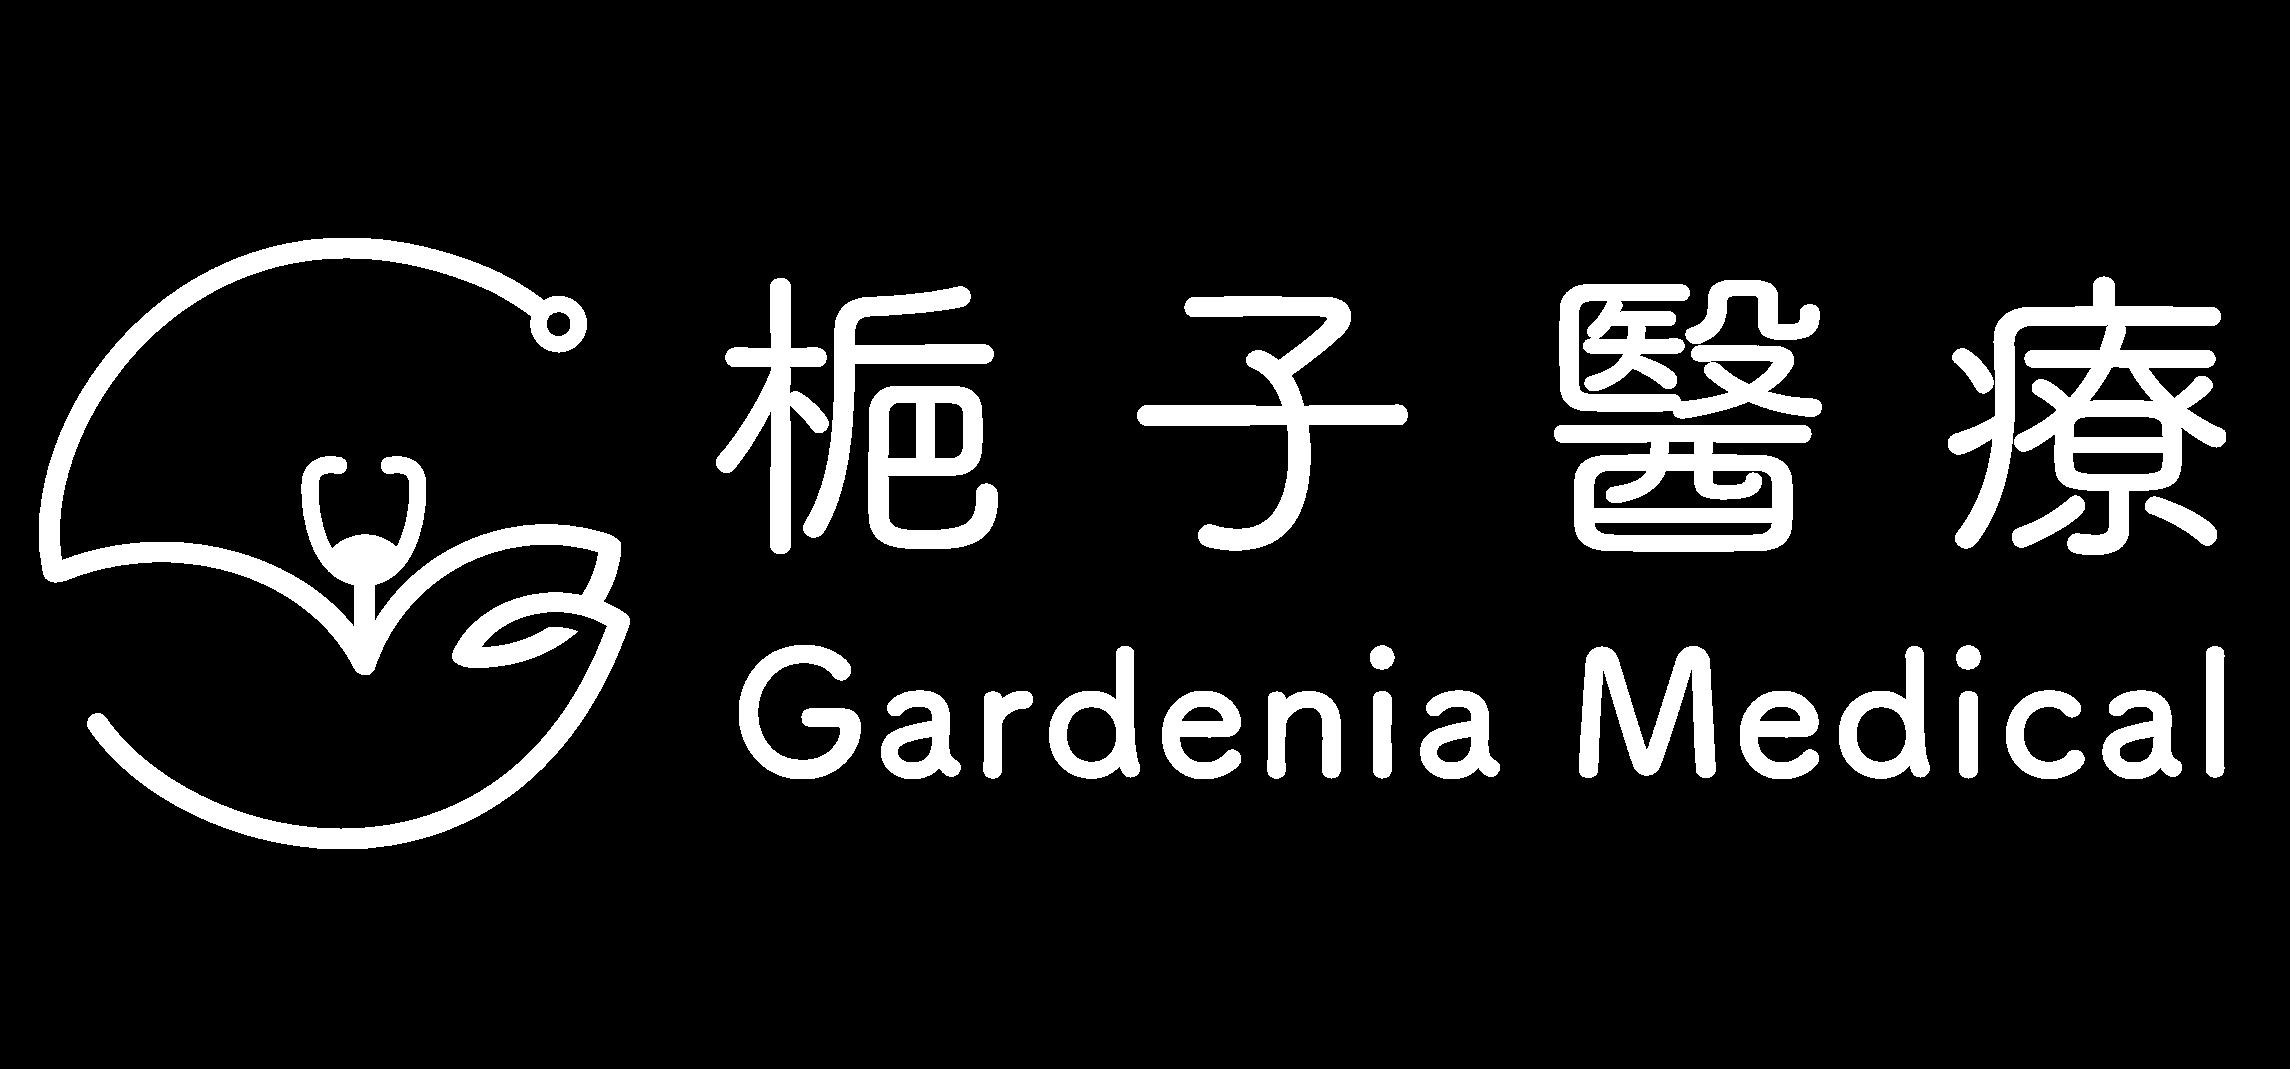 Gardenia Medical 梔子醫療